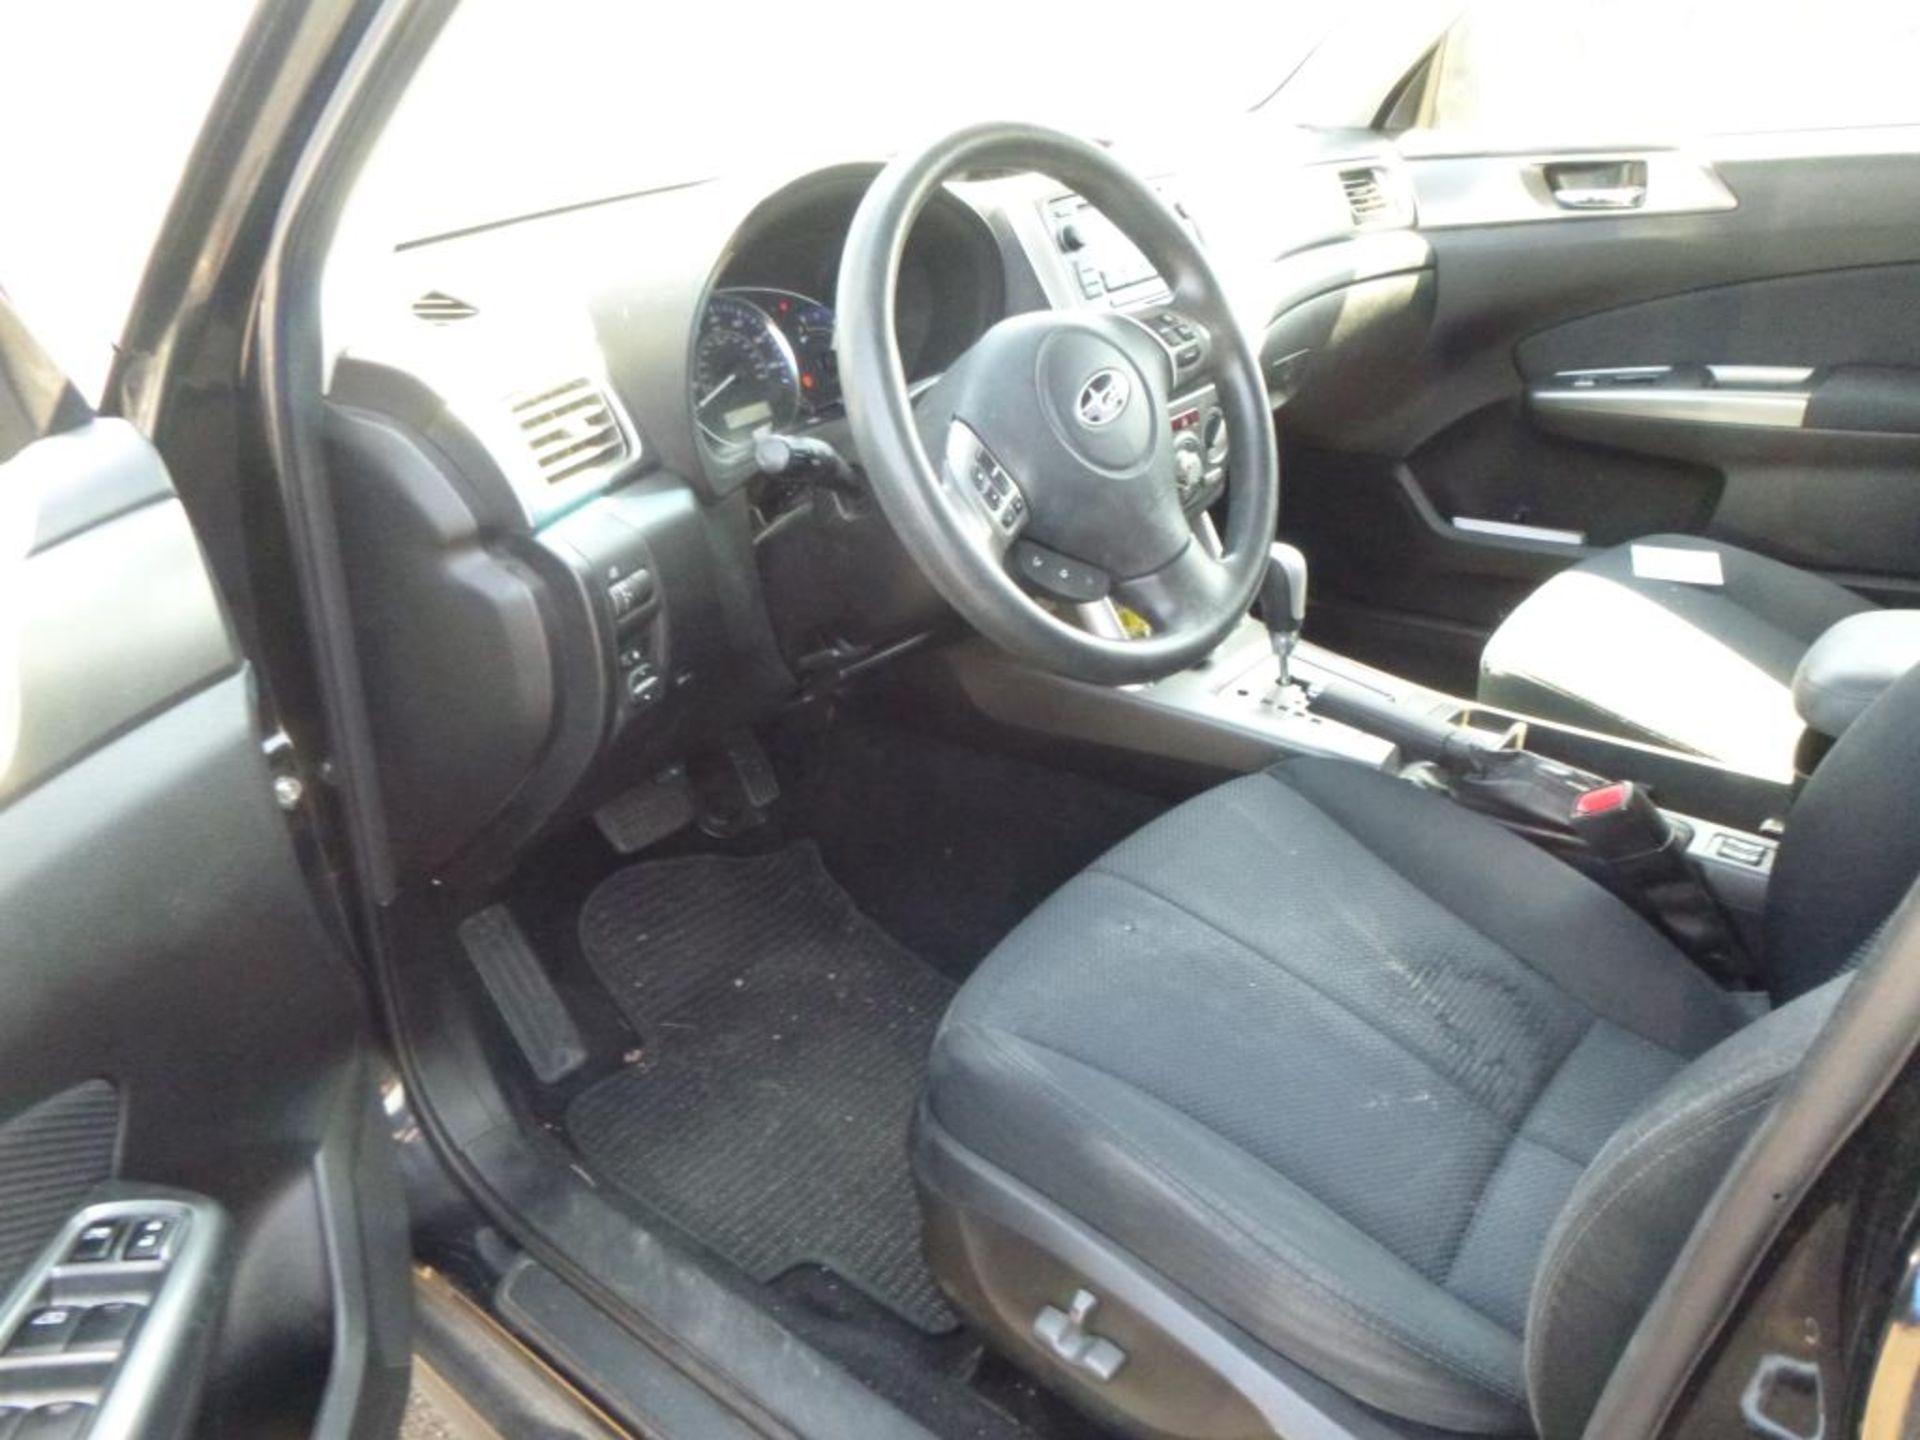 2011 Subaru Forester - Image 8 of 11